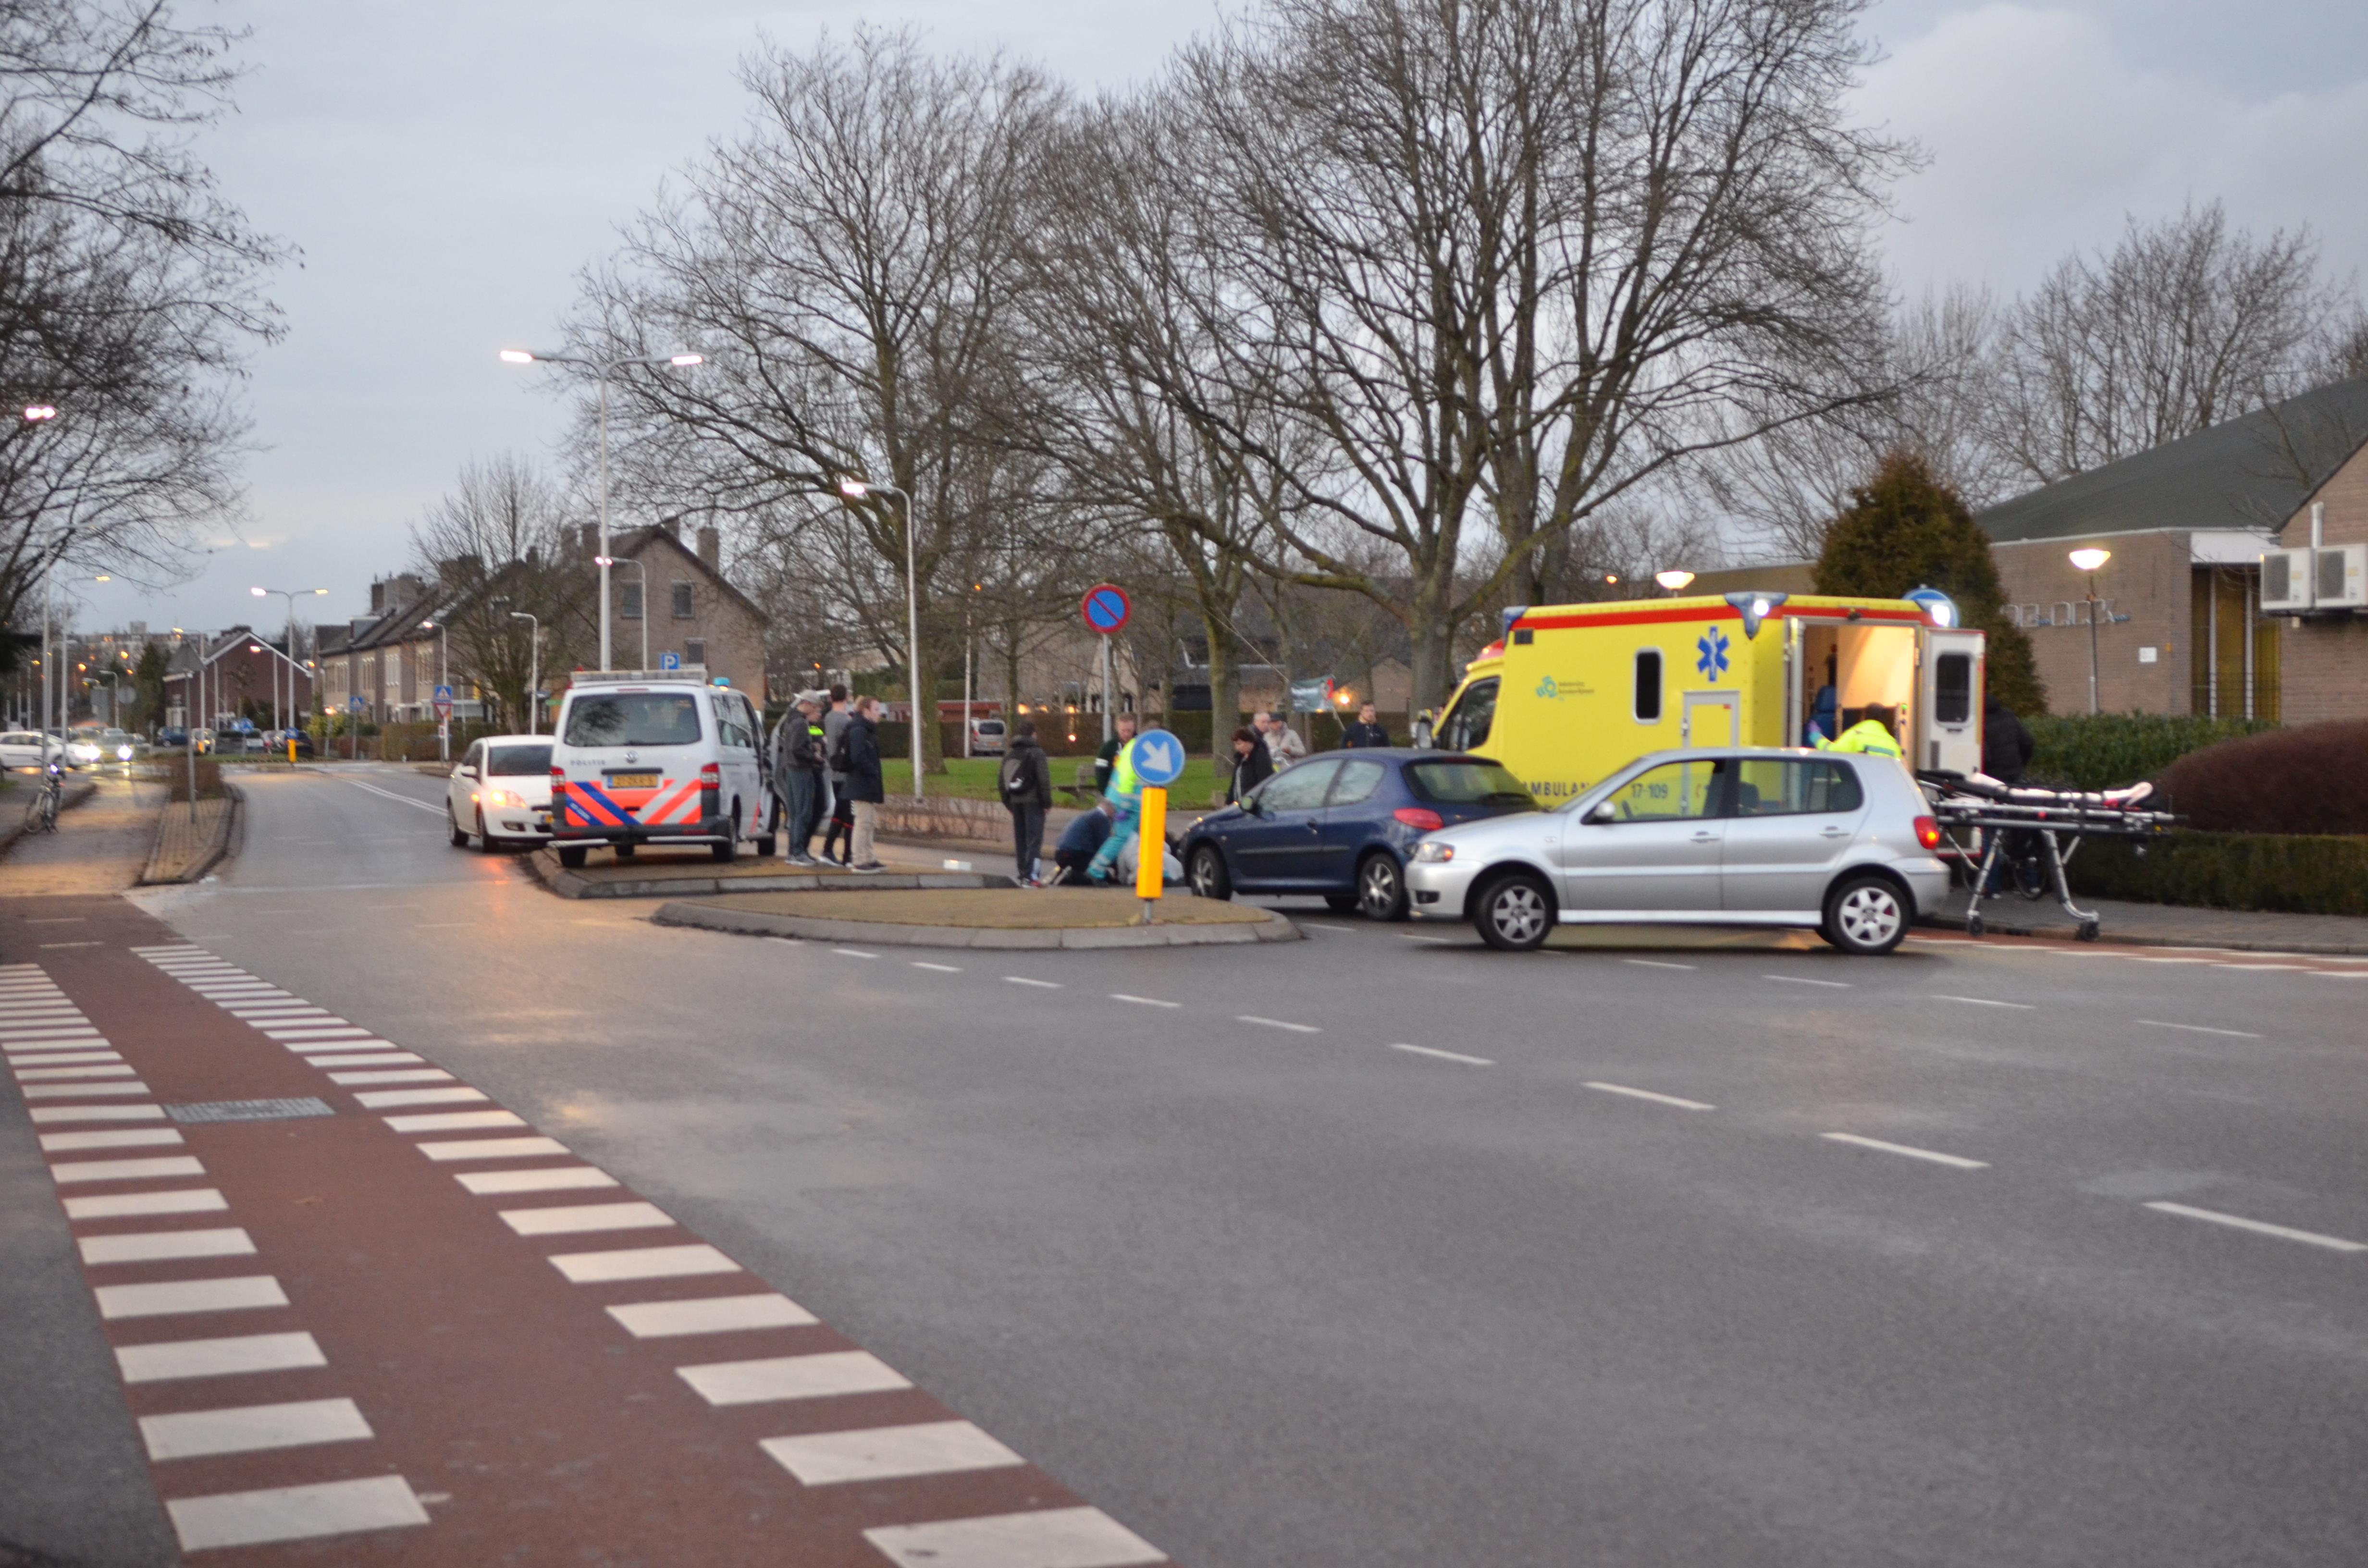 Ongeval op de Burgemeester Aalberslaan